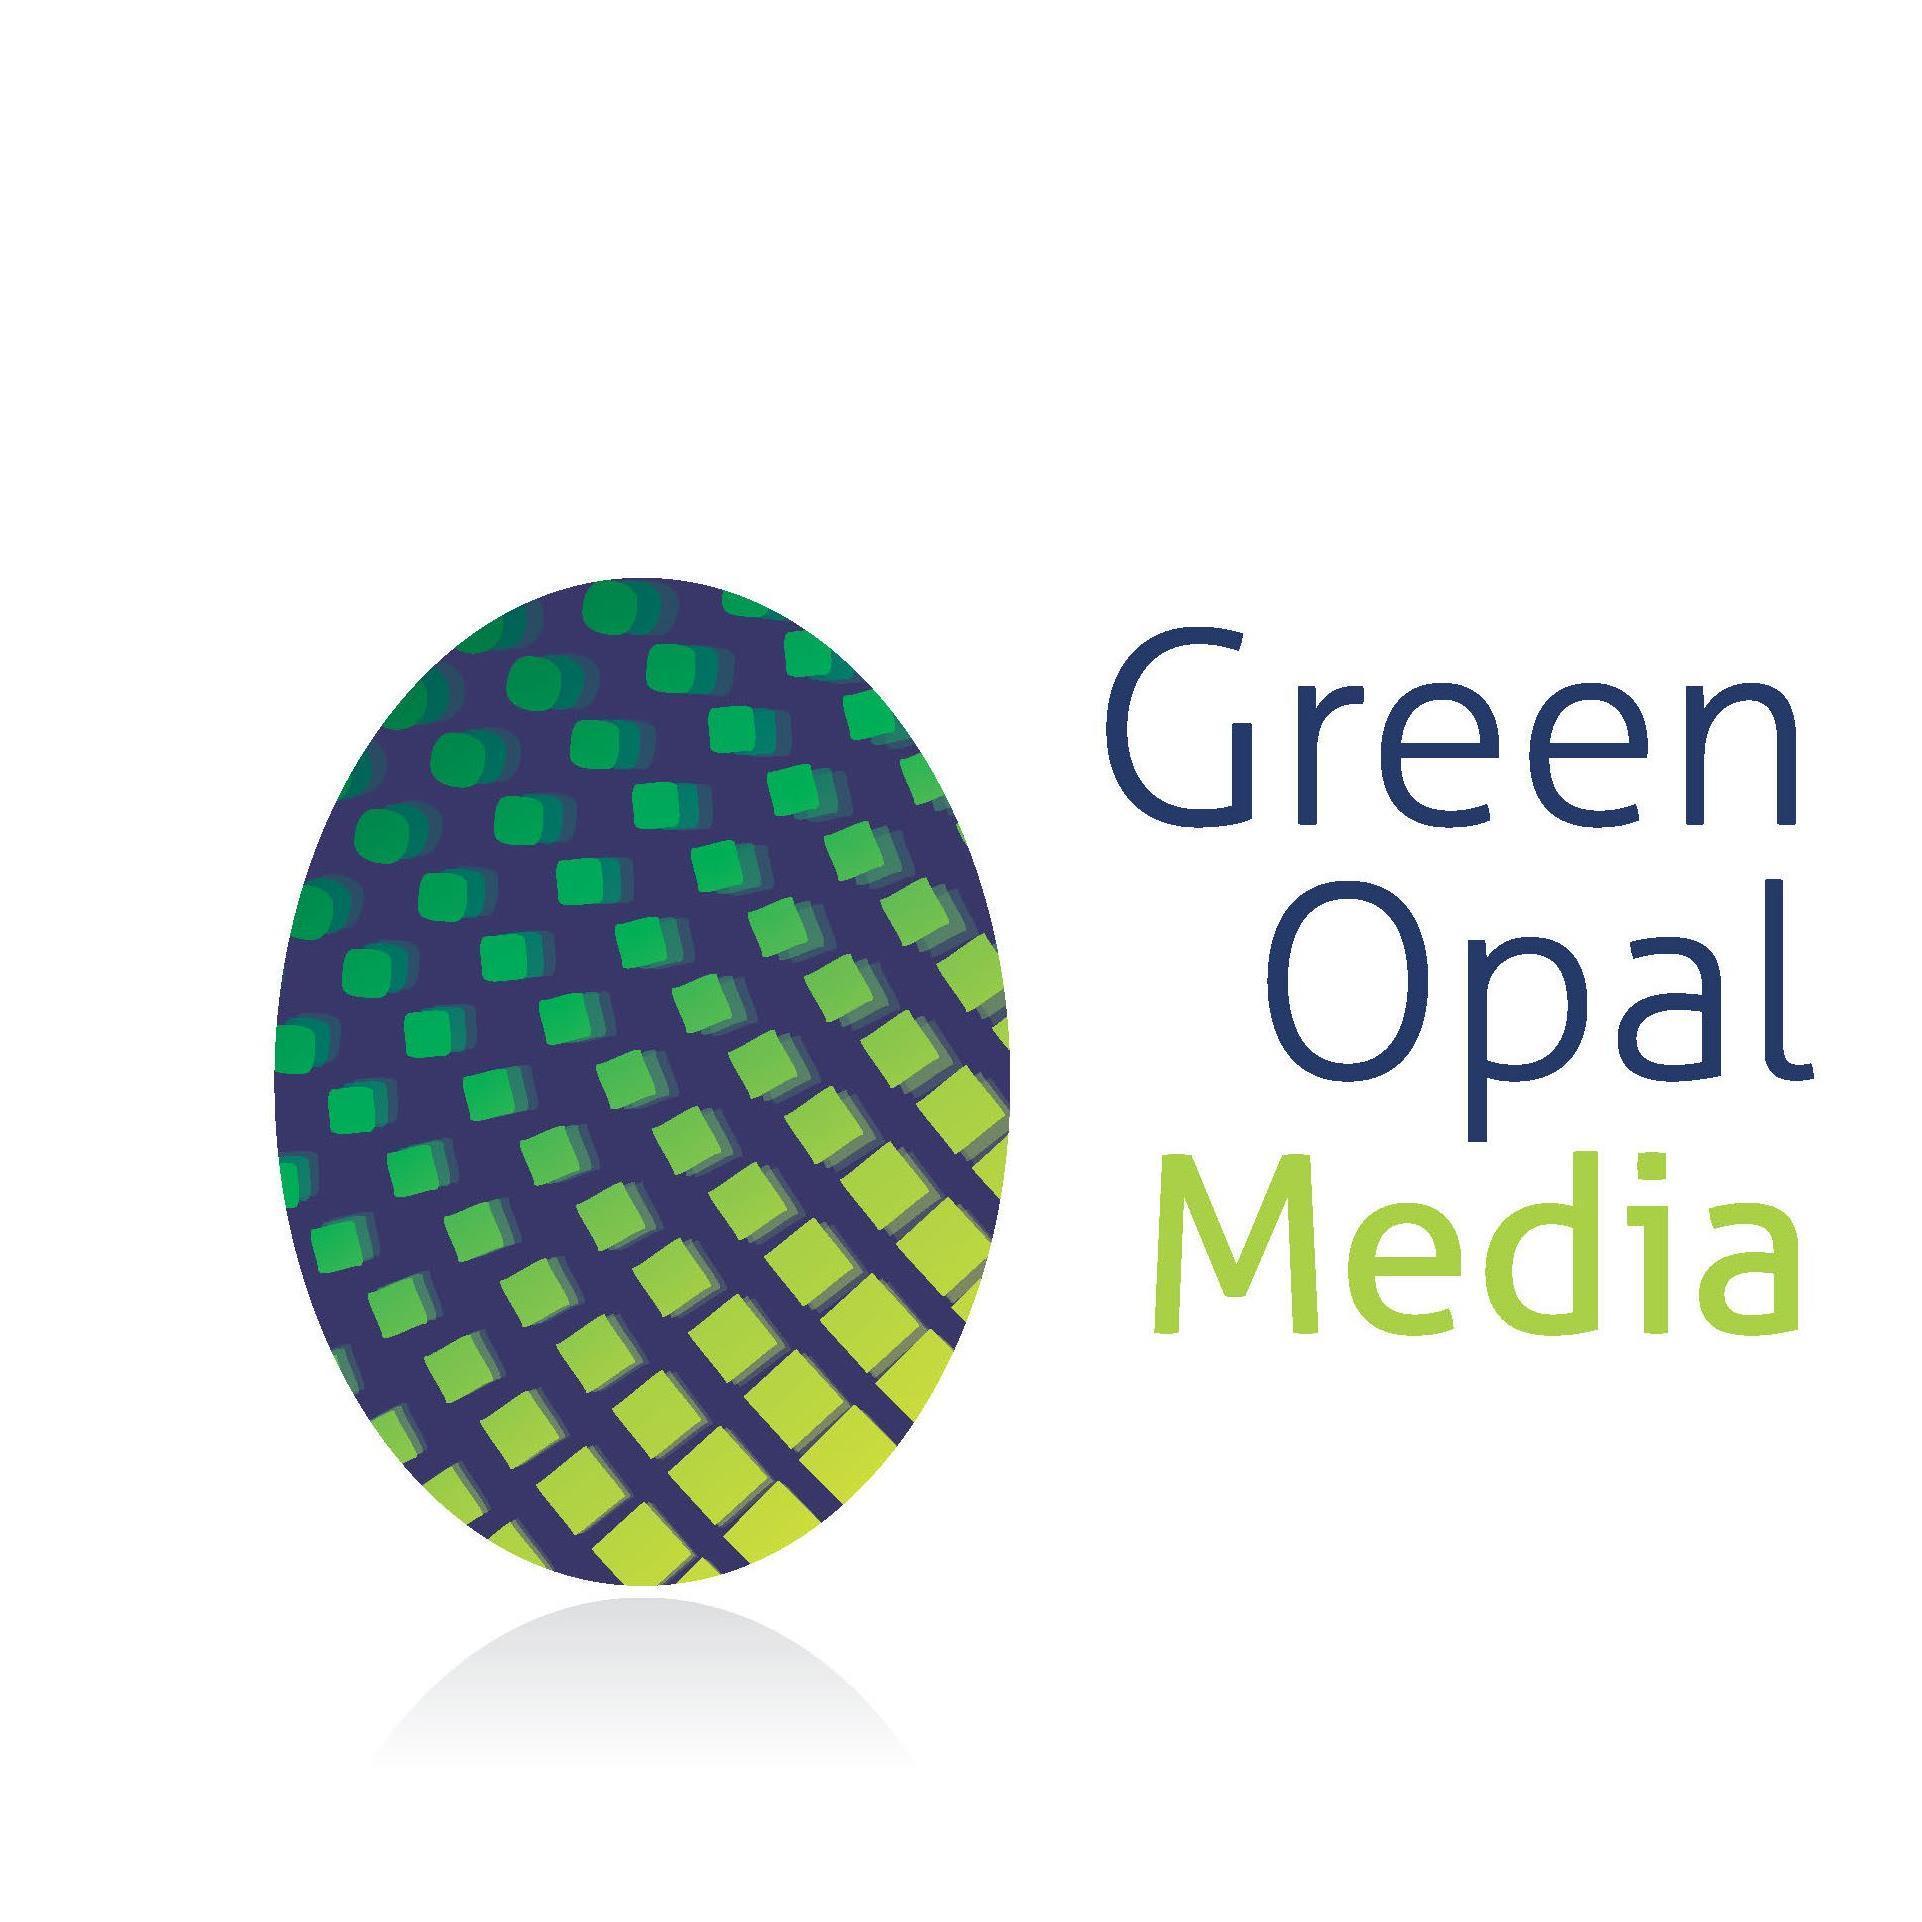 Green Opal Media